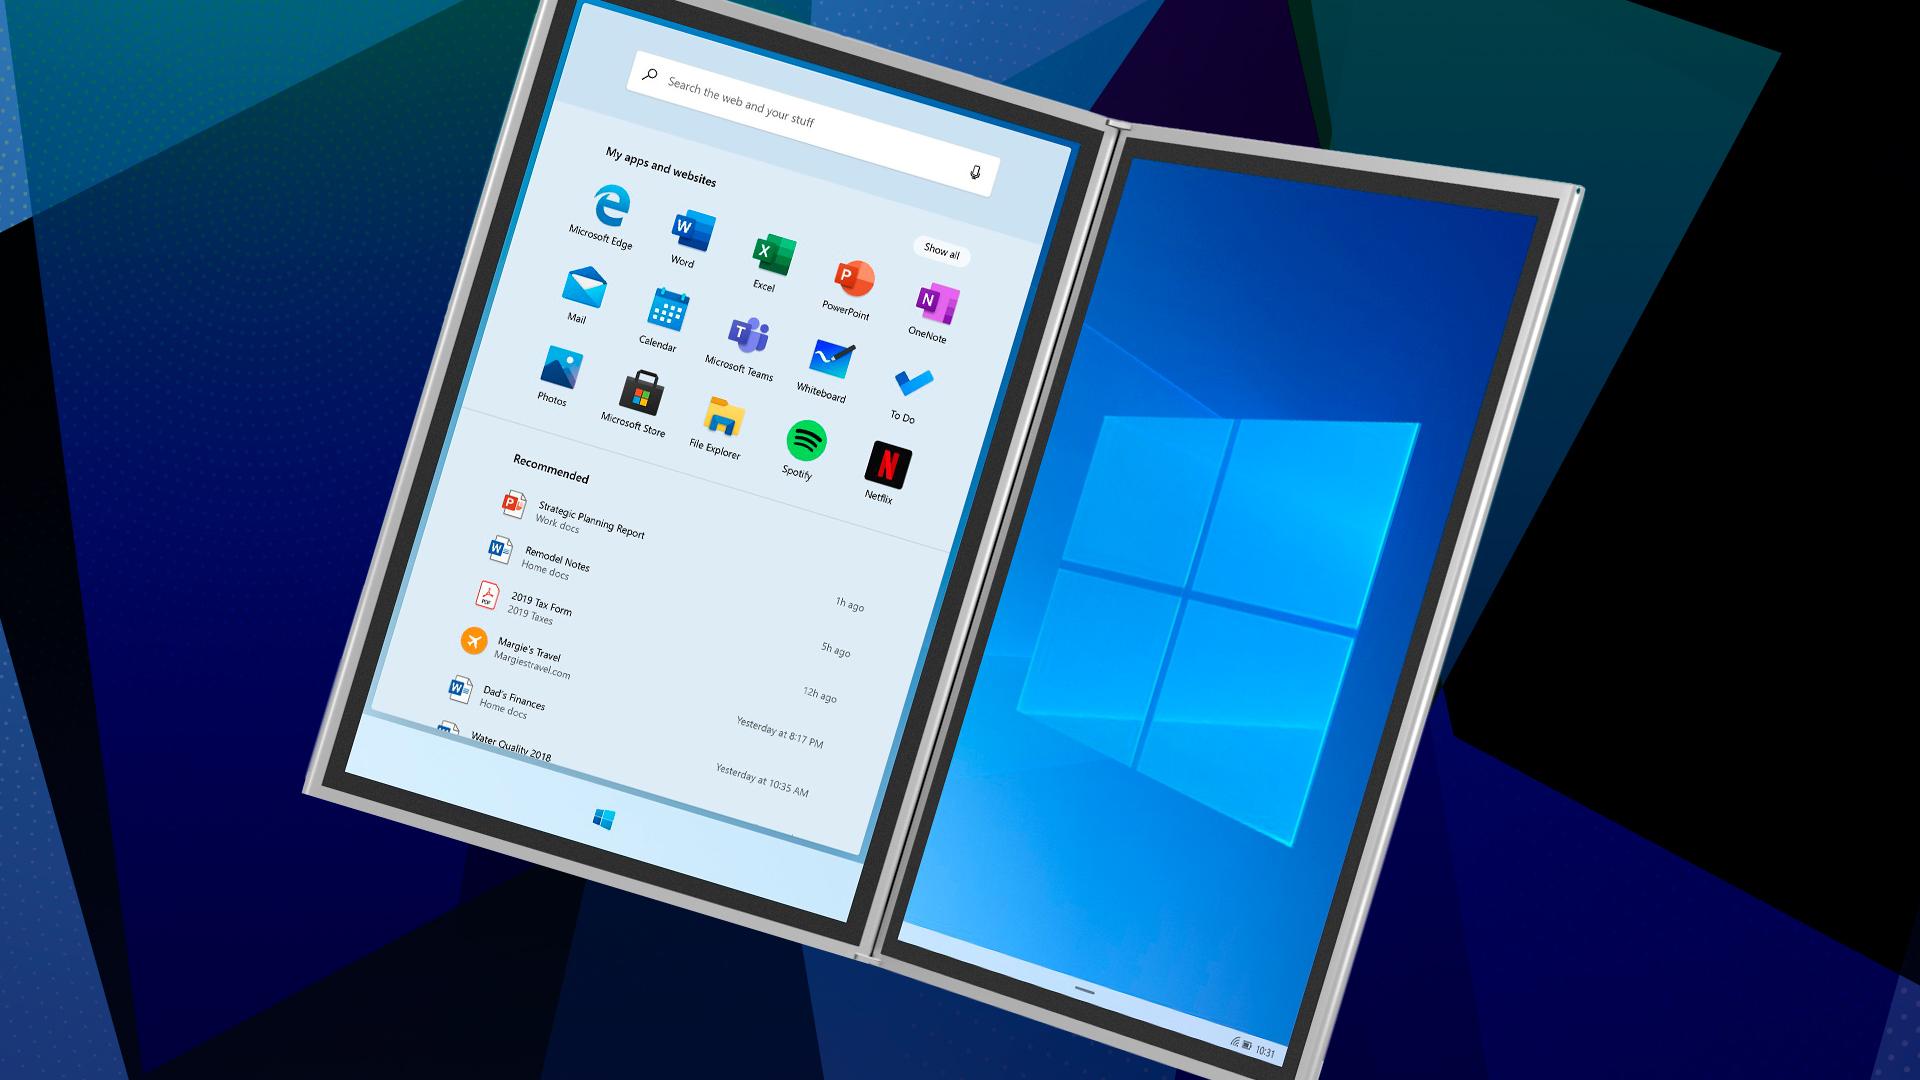 Microsoft, Windows 10, Tablet, Windows Logo, Windows 10X, Windows On ARM, Windows 10 ARM, Windows 10 X, Windows Tablet, Windows 10X Logo, Microsoft Windows 10 X, Microsoft Windows 10X, Tablet PC, Windows Desktop